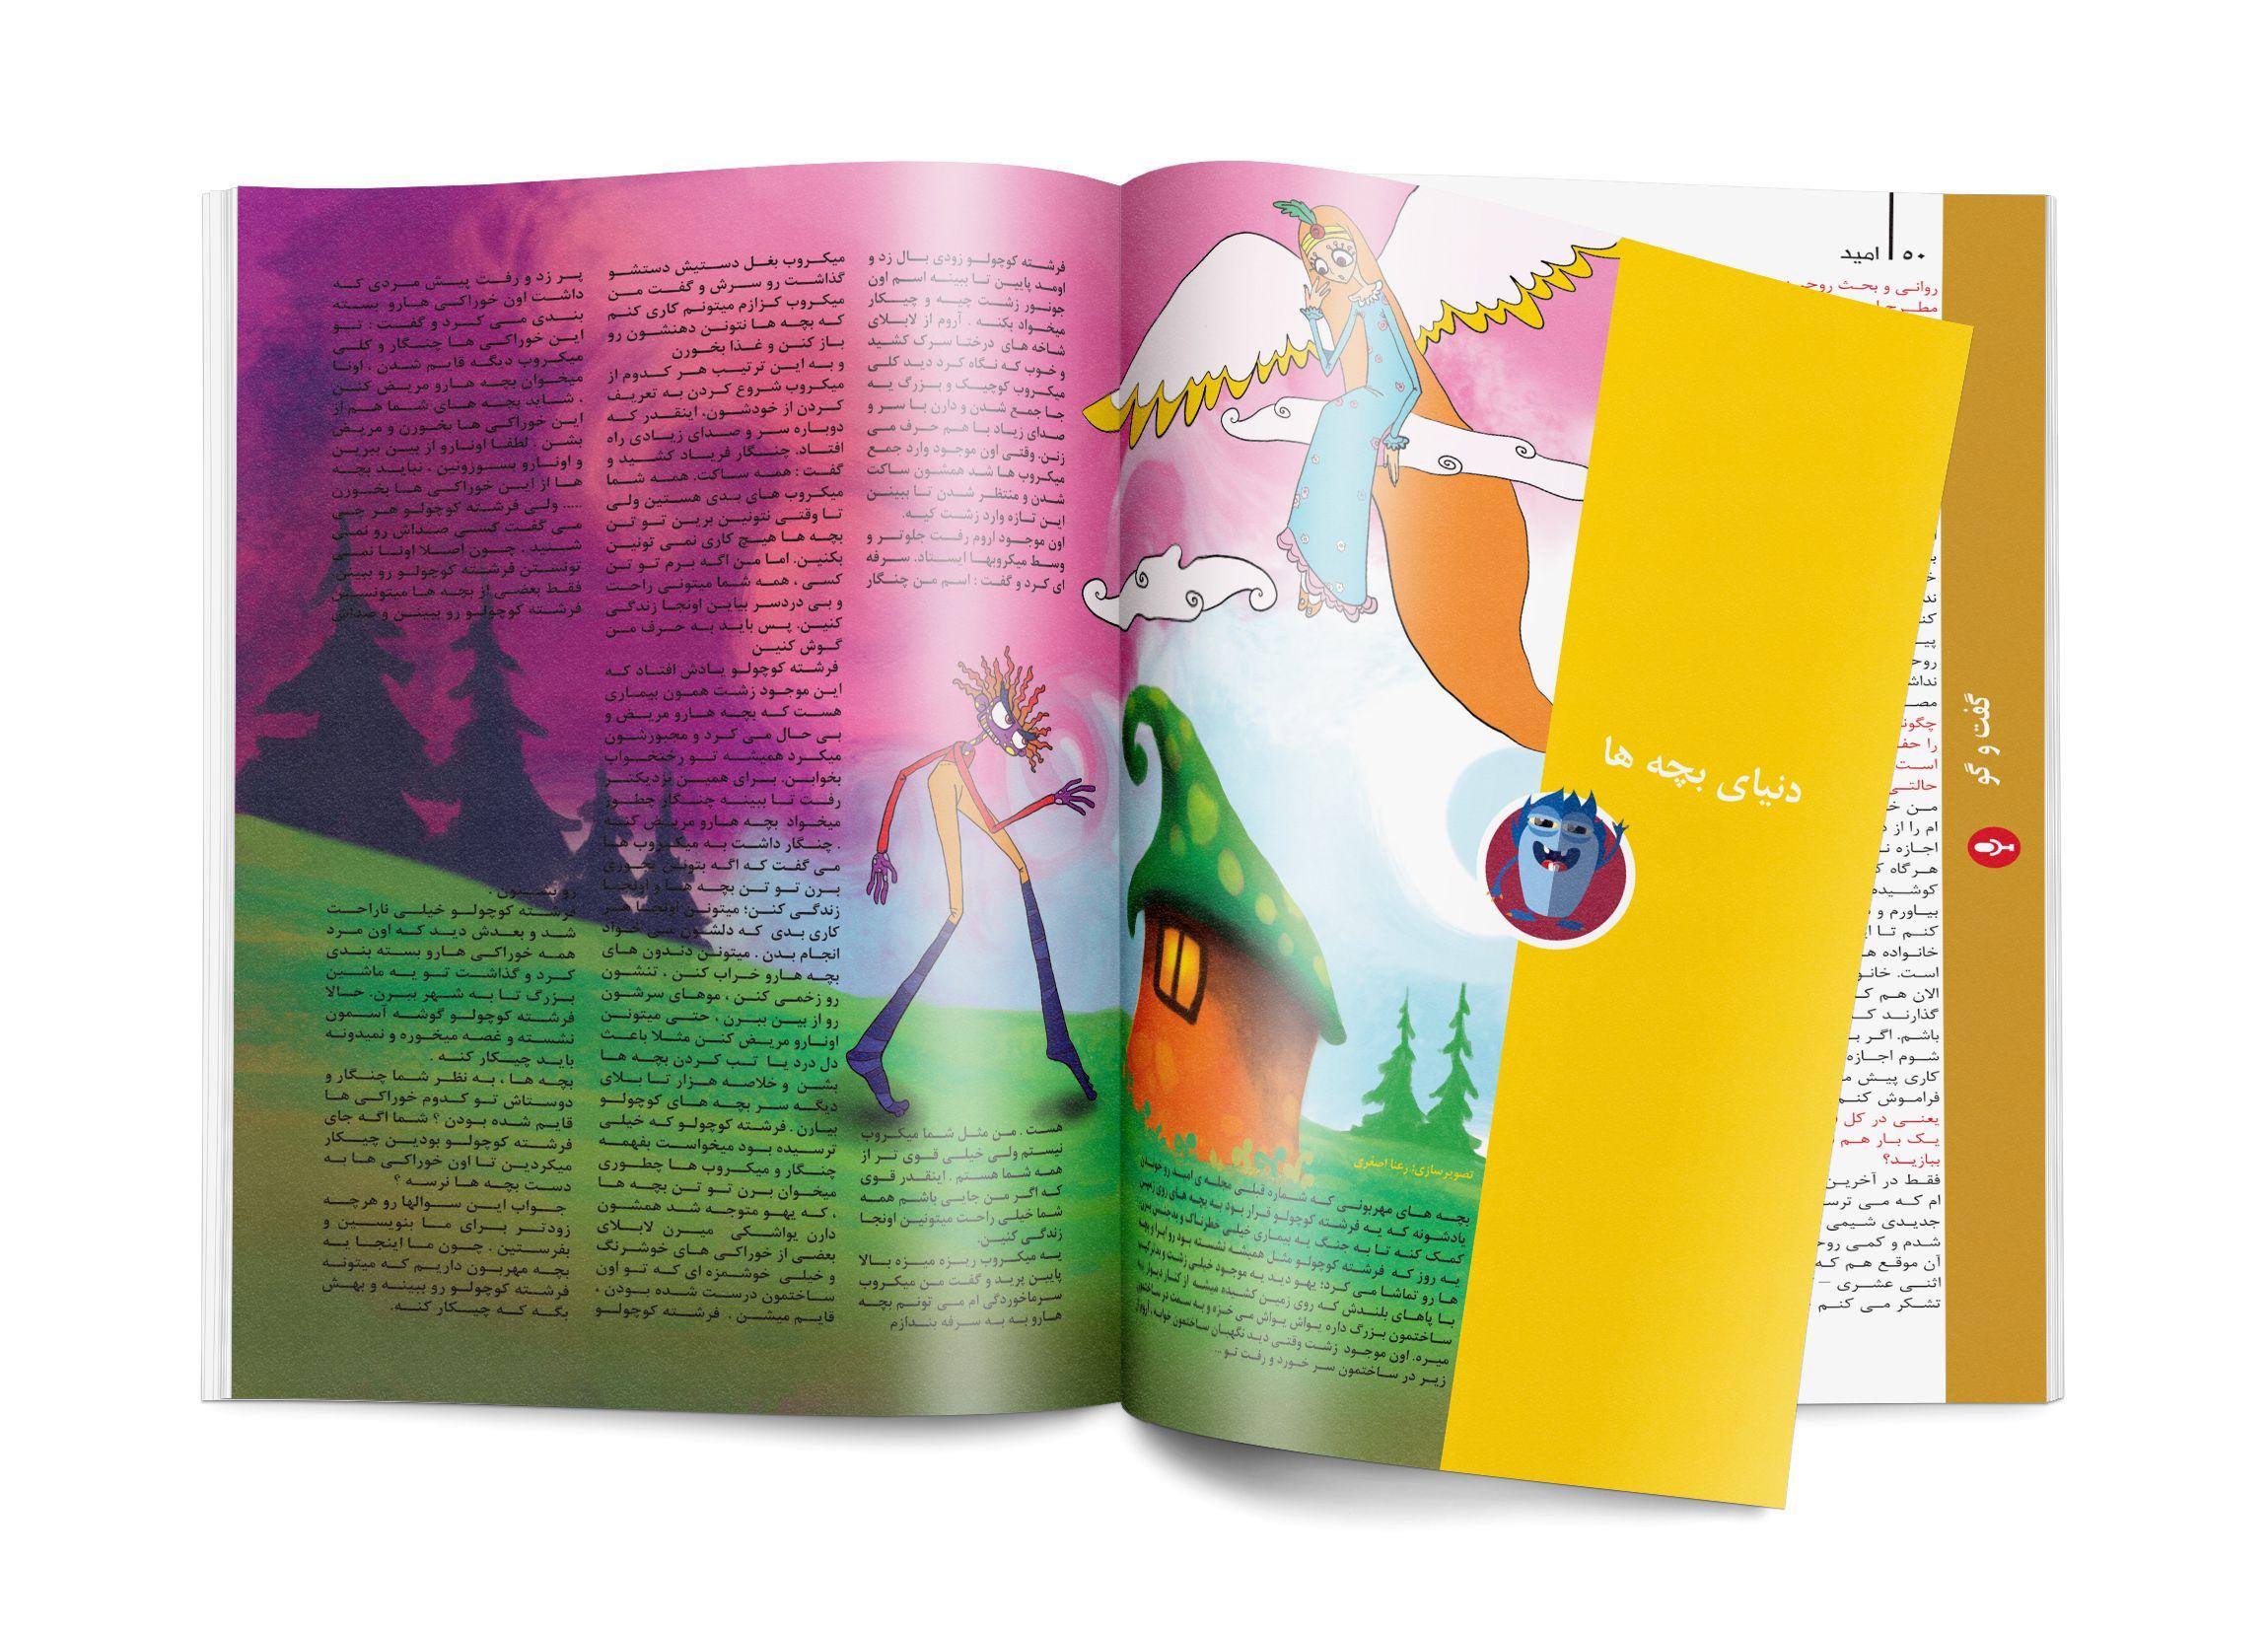 Layout Design: Ghavipanjeh Illustrator: Rana asghari Issue:  Omid  Magazine No.07 2015